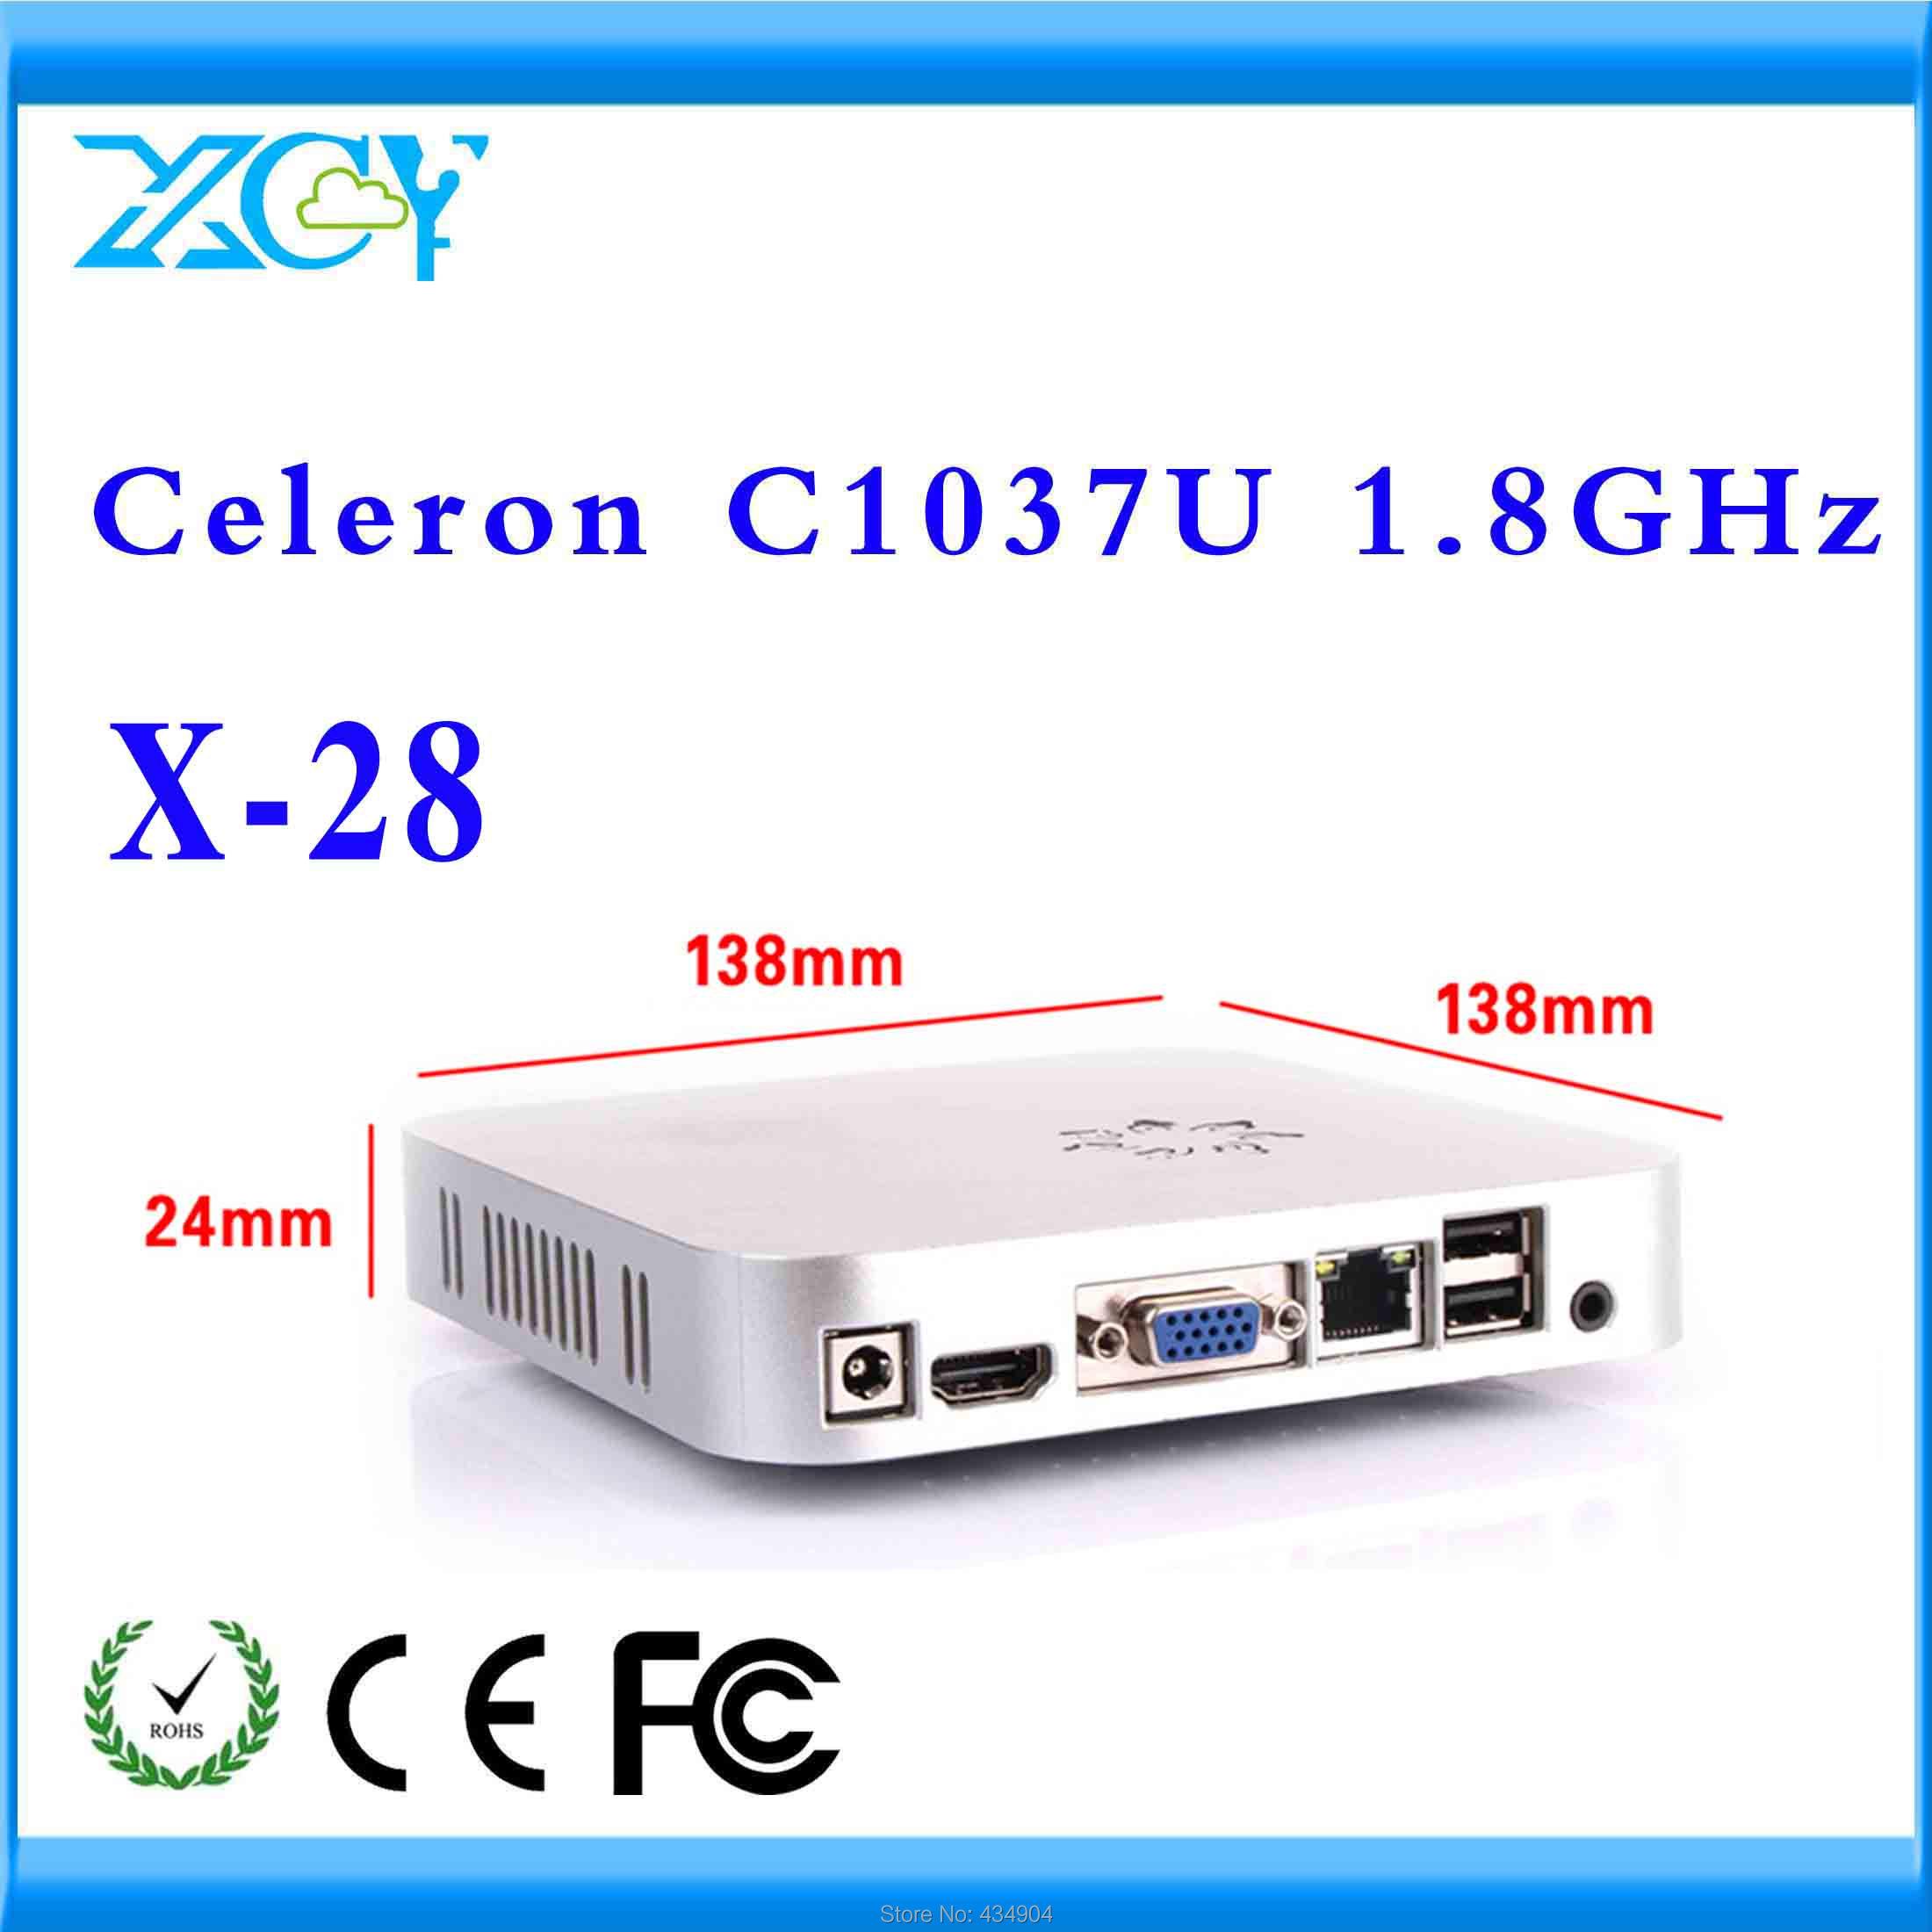 small size but durable mini pc terminal pc windows server mini itx htpc X-28 c1037u very small but powerfull PC support hd video(China (Mainland))